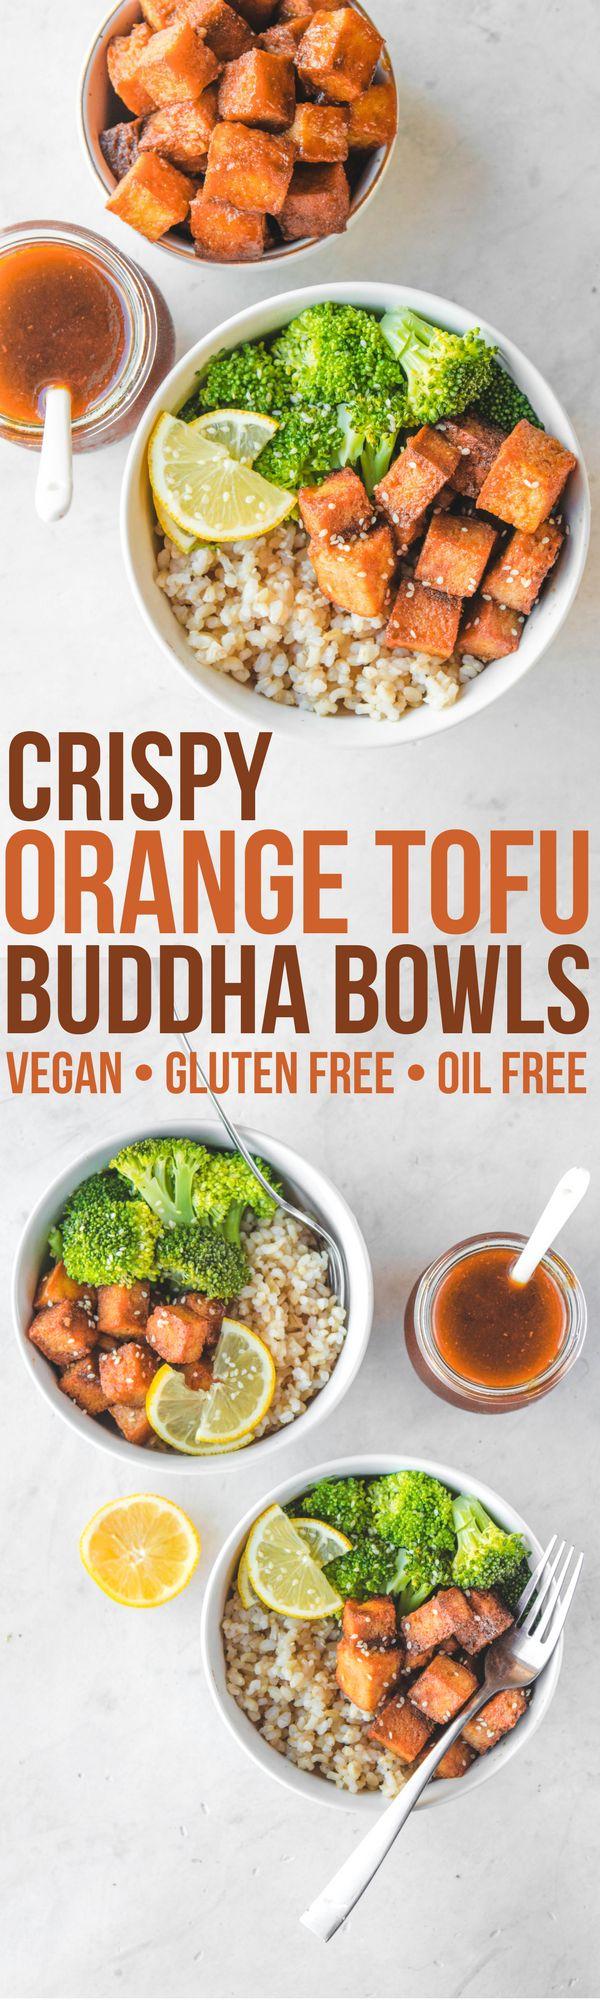 Orange Tofu Buddha Bowls (Vegan + GF) - From My Bowl